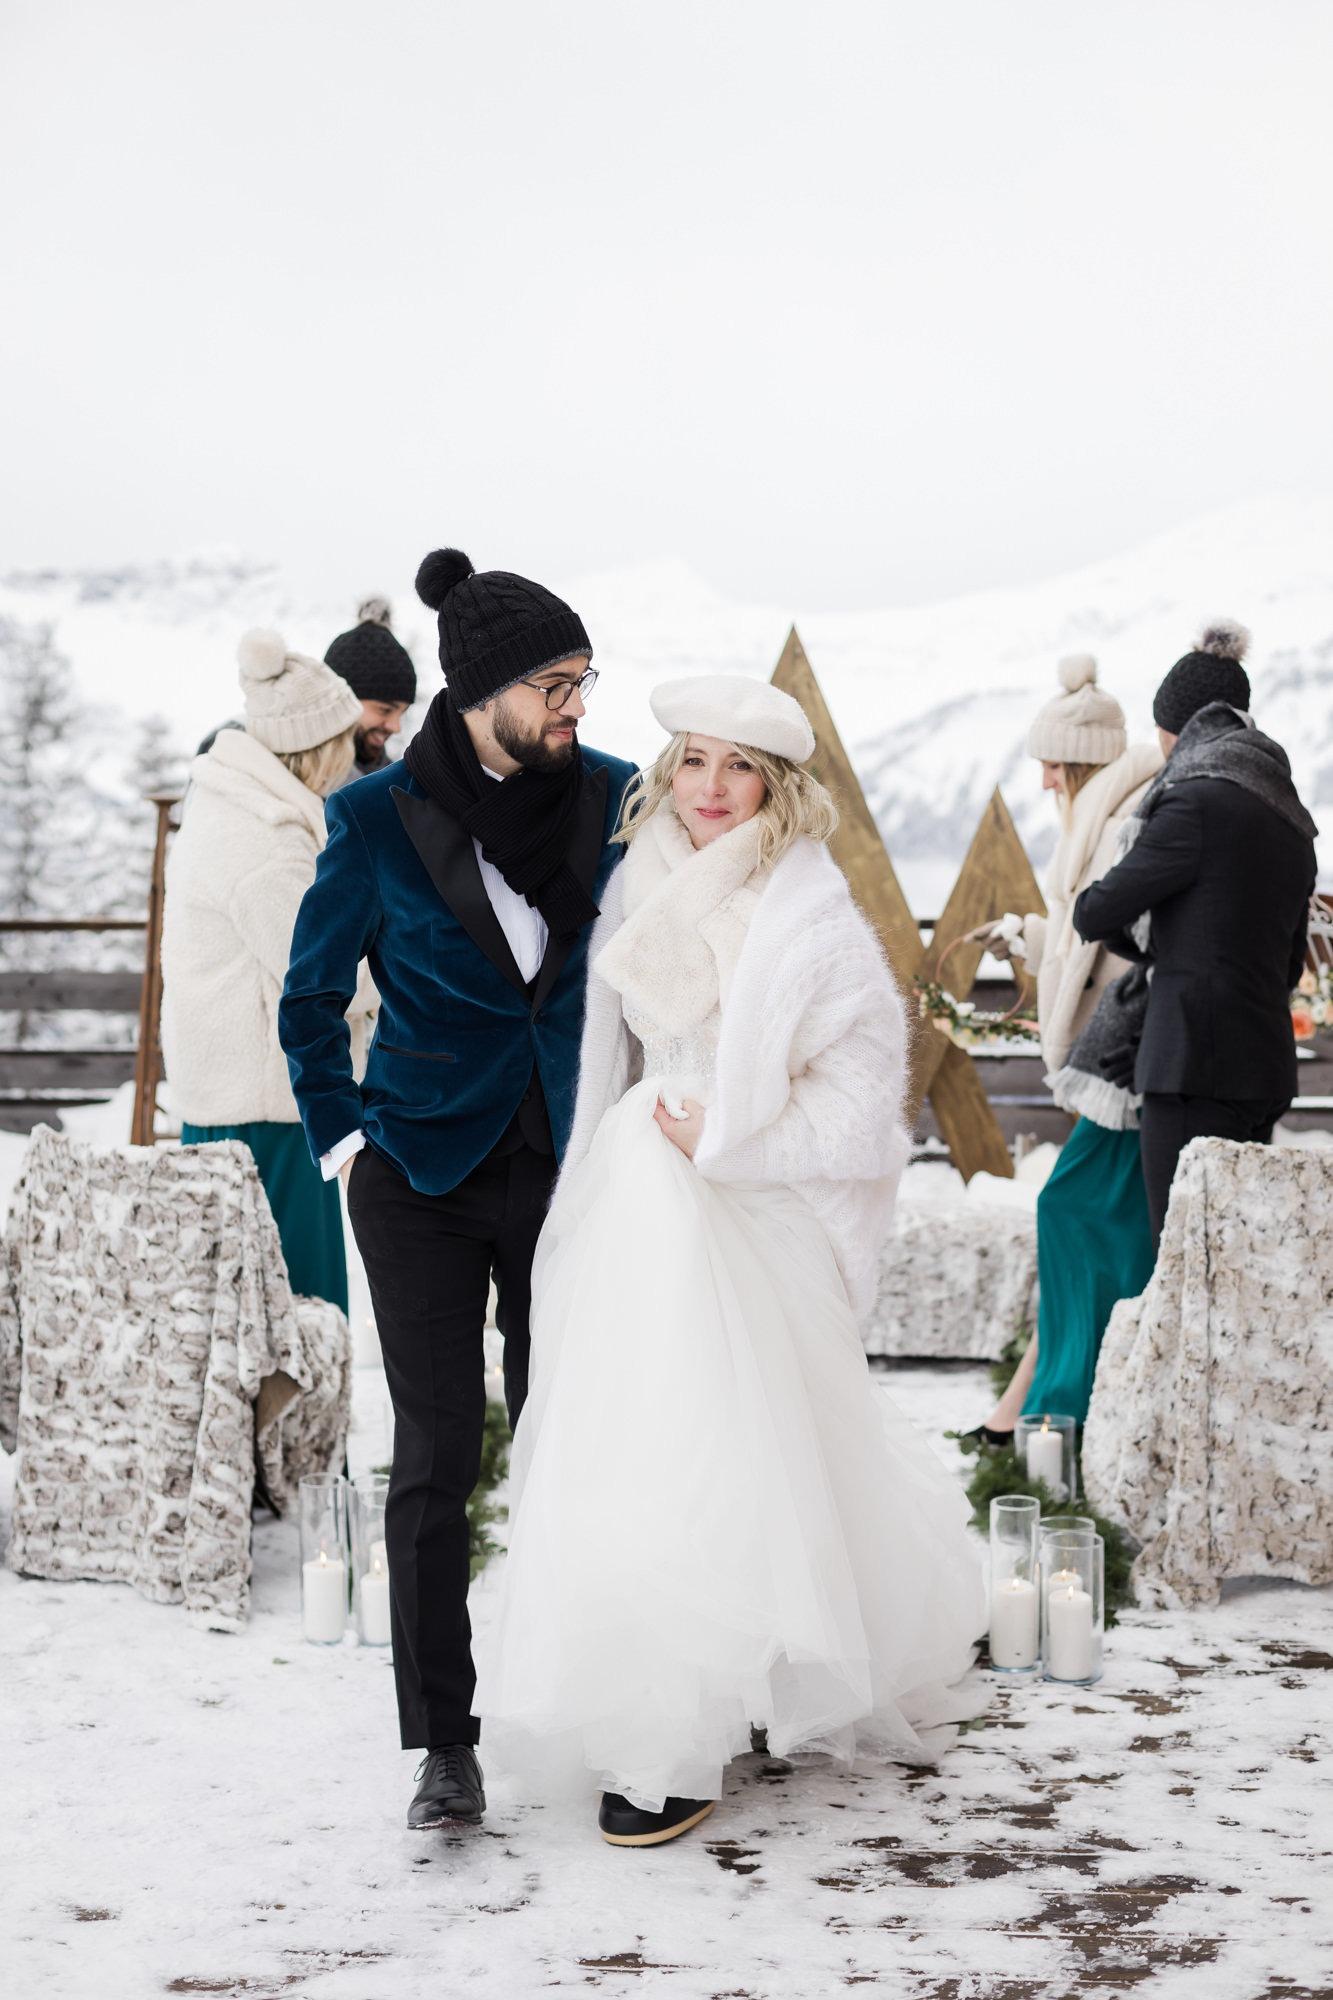 wedding planner lyon mariage hiver - les moments m